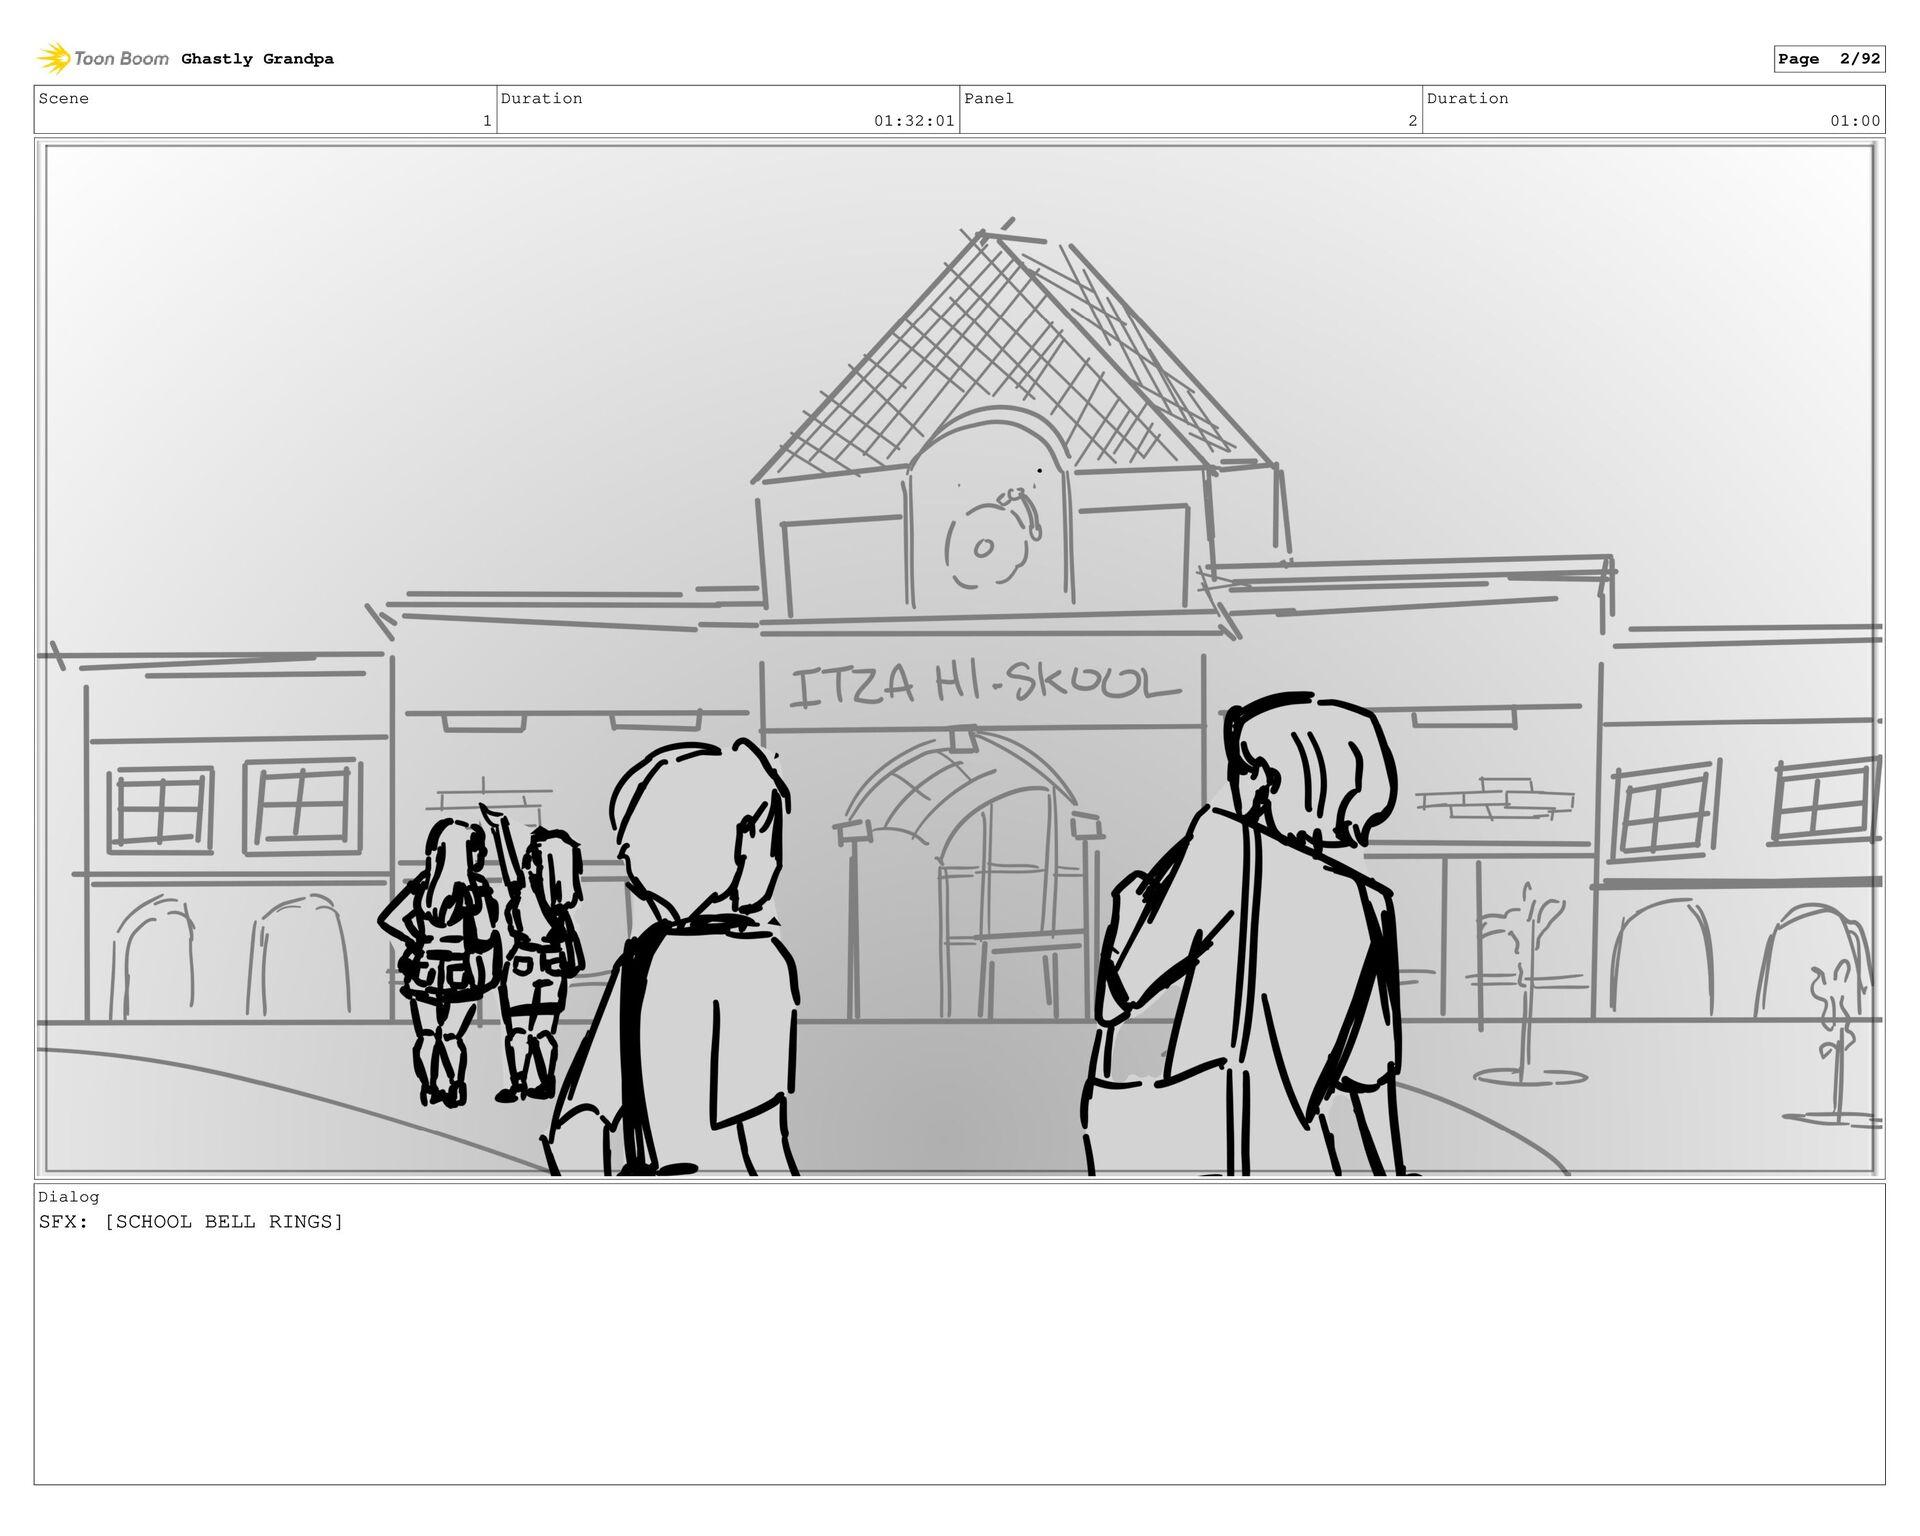 Scene 1 Duration 01:27:01 Panel 1 Duration 01:0...